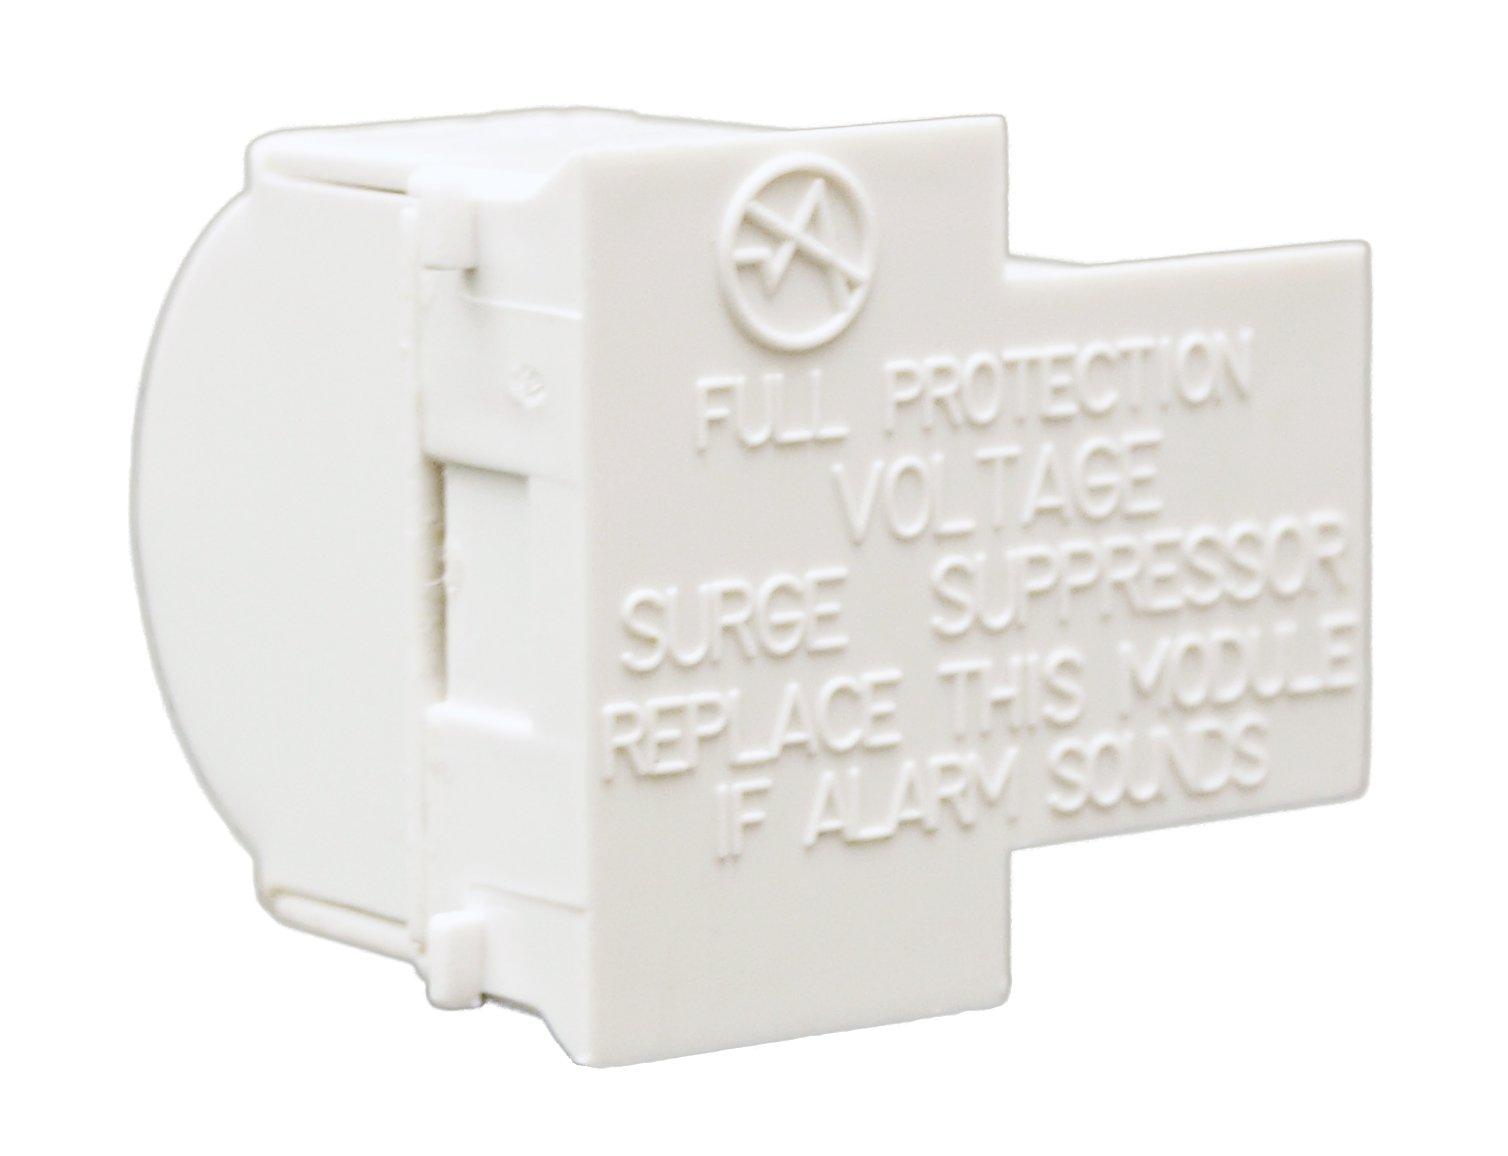 Datacomm 45-0041-SB Surge Block for 45-0041-WH